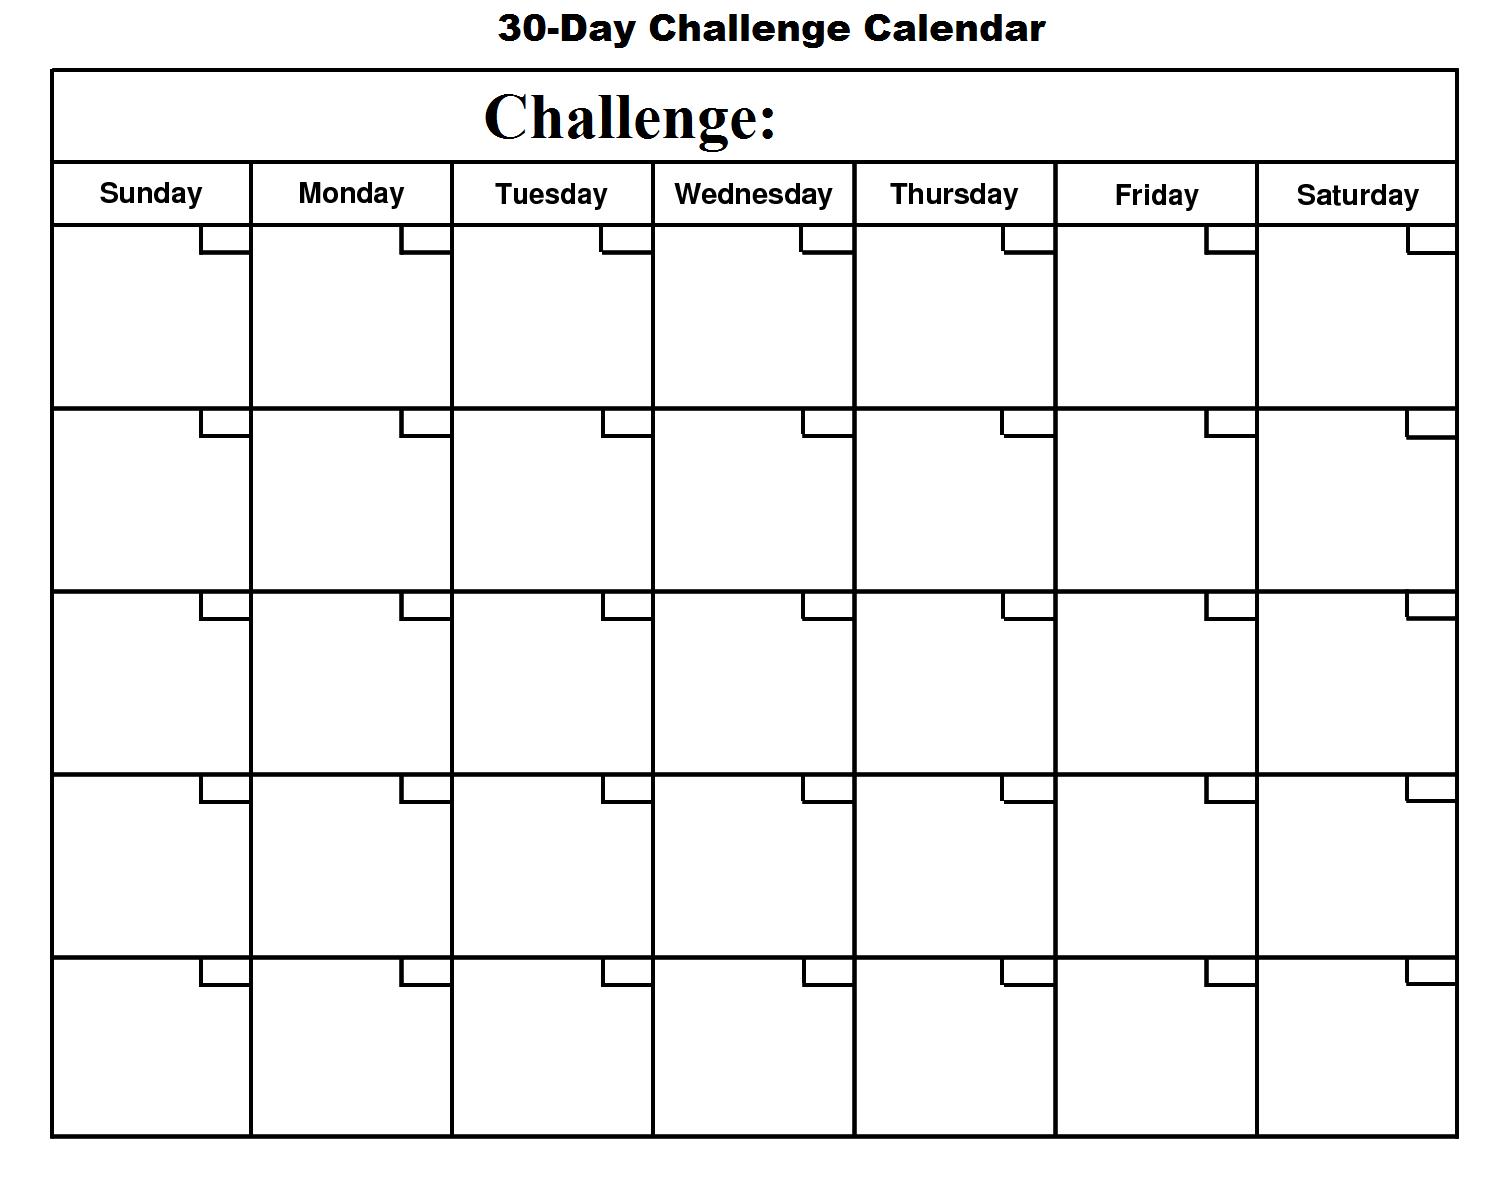 30 Day Challenge Calendar - Basic Growth Inside 30 Day Challenge Calendar